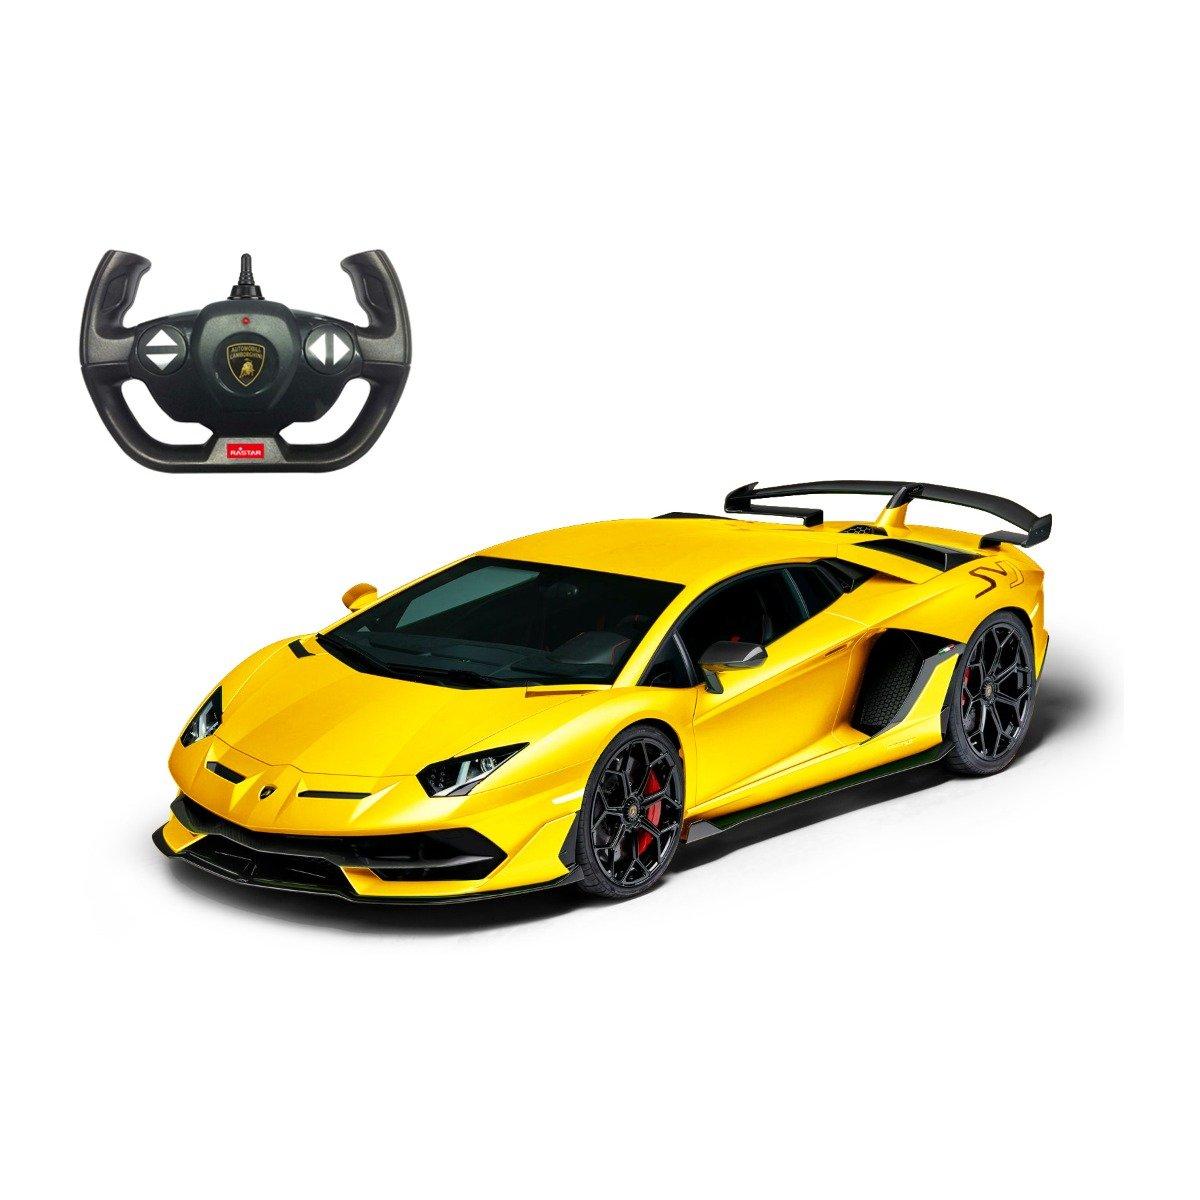 Masina cu telecomanda Rastar Lamborghini Aventador SVJ, 1:14, Galben